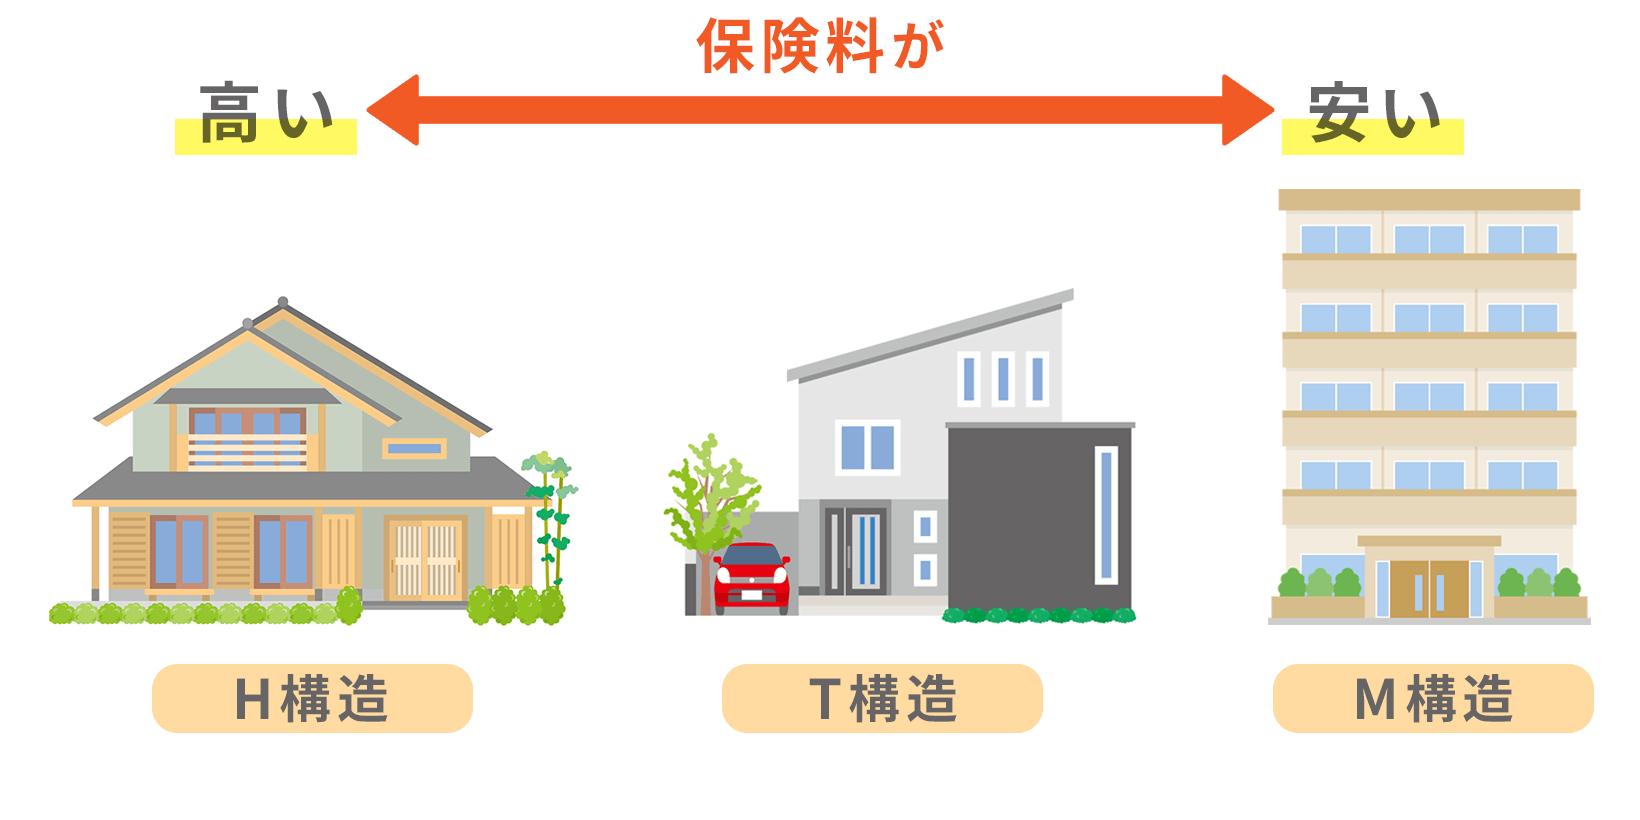 建築構造や賃貸・分譲で見る火災保険相場